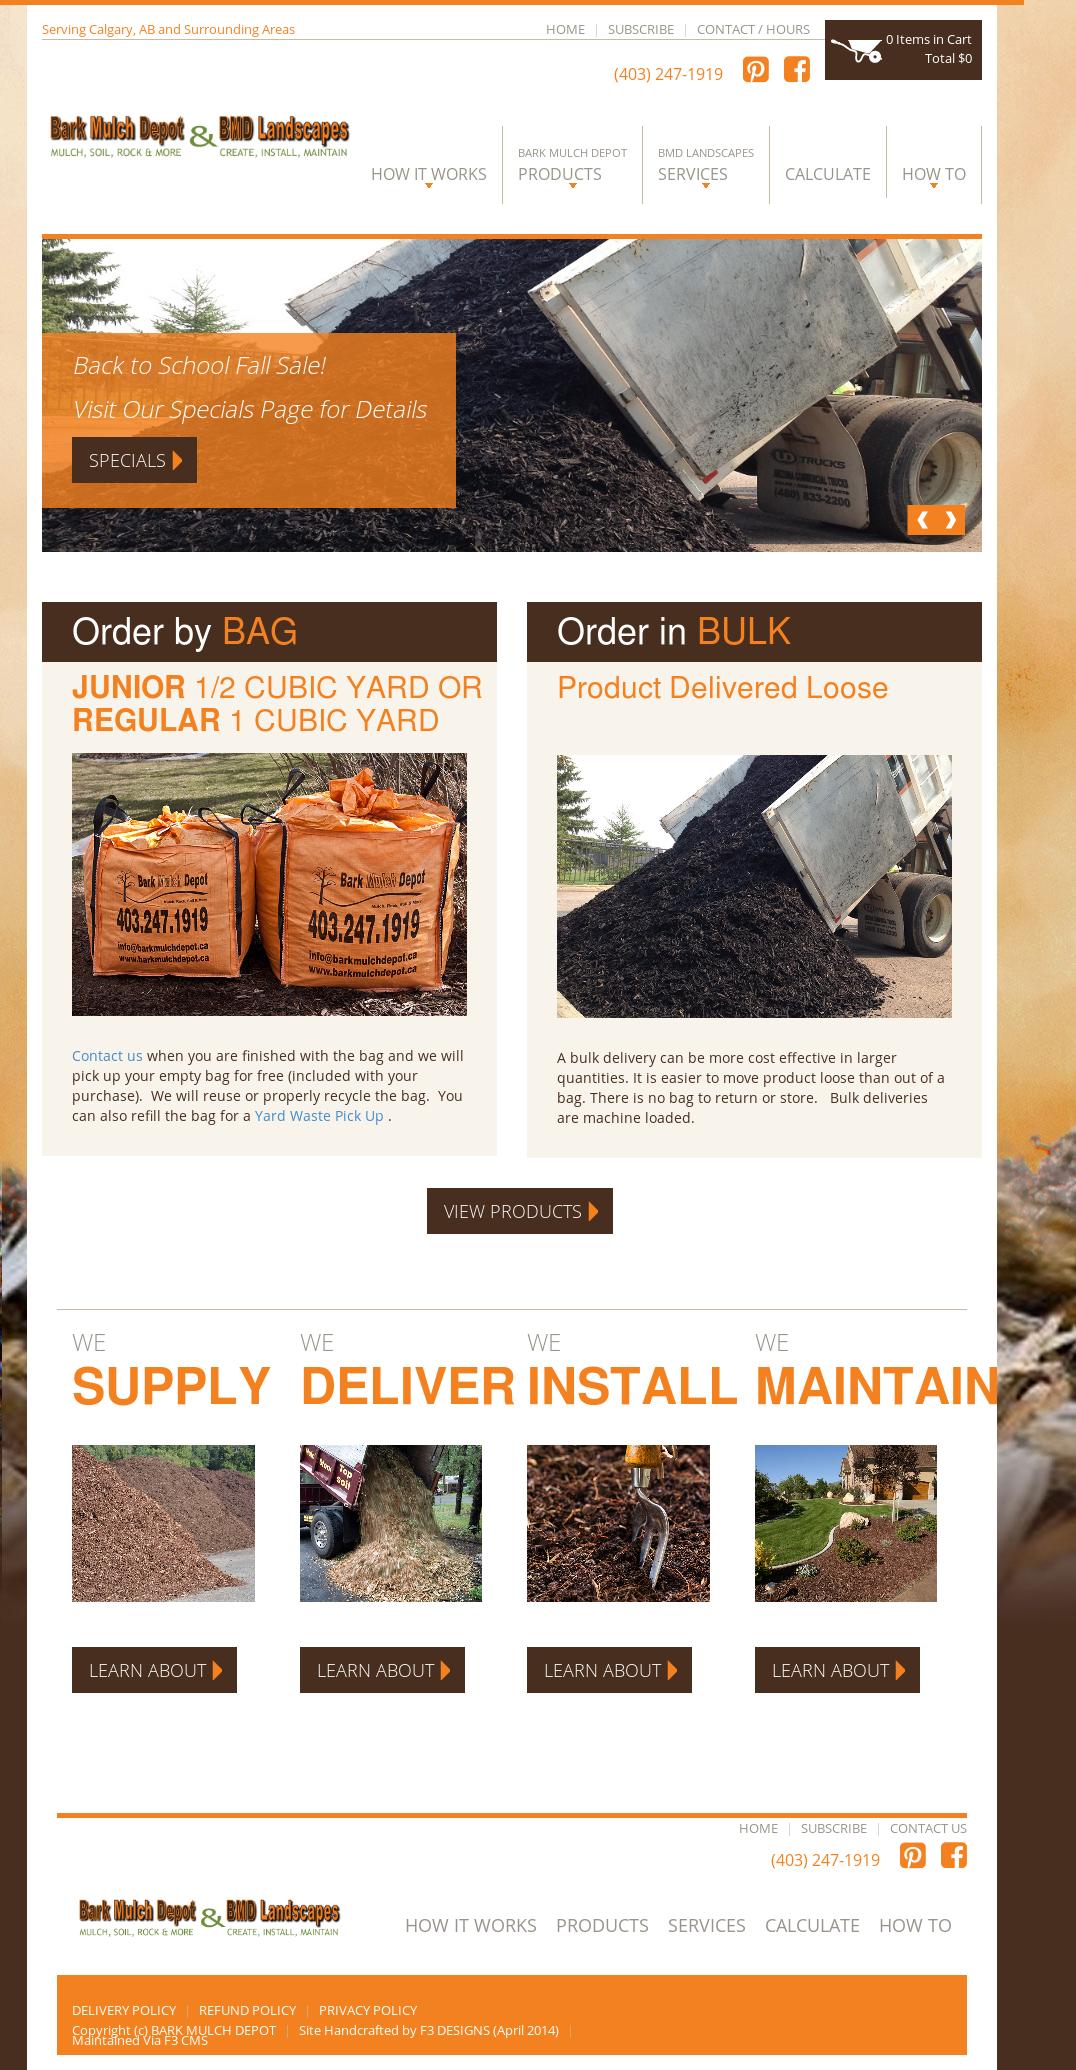 Bark Mulch Depot & Bmd Landscapes Competitors, Revenue and